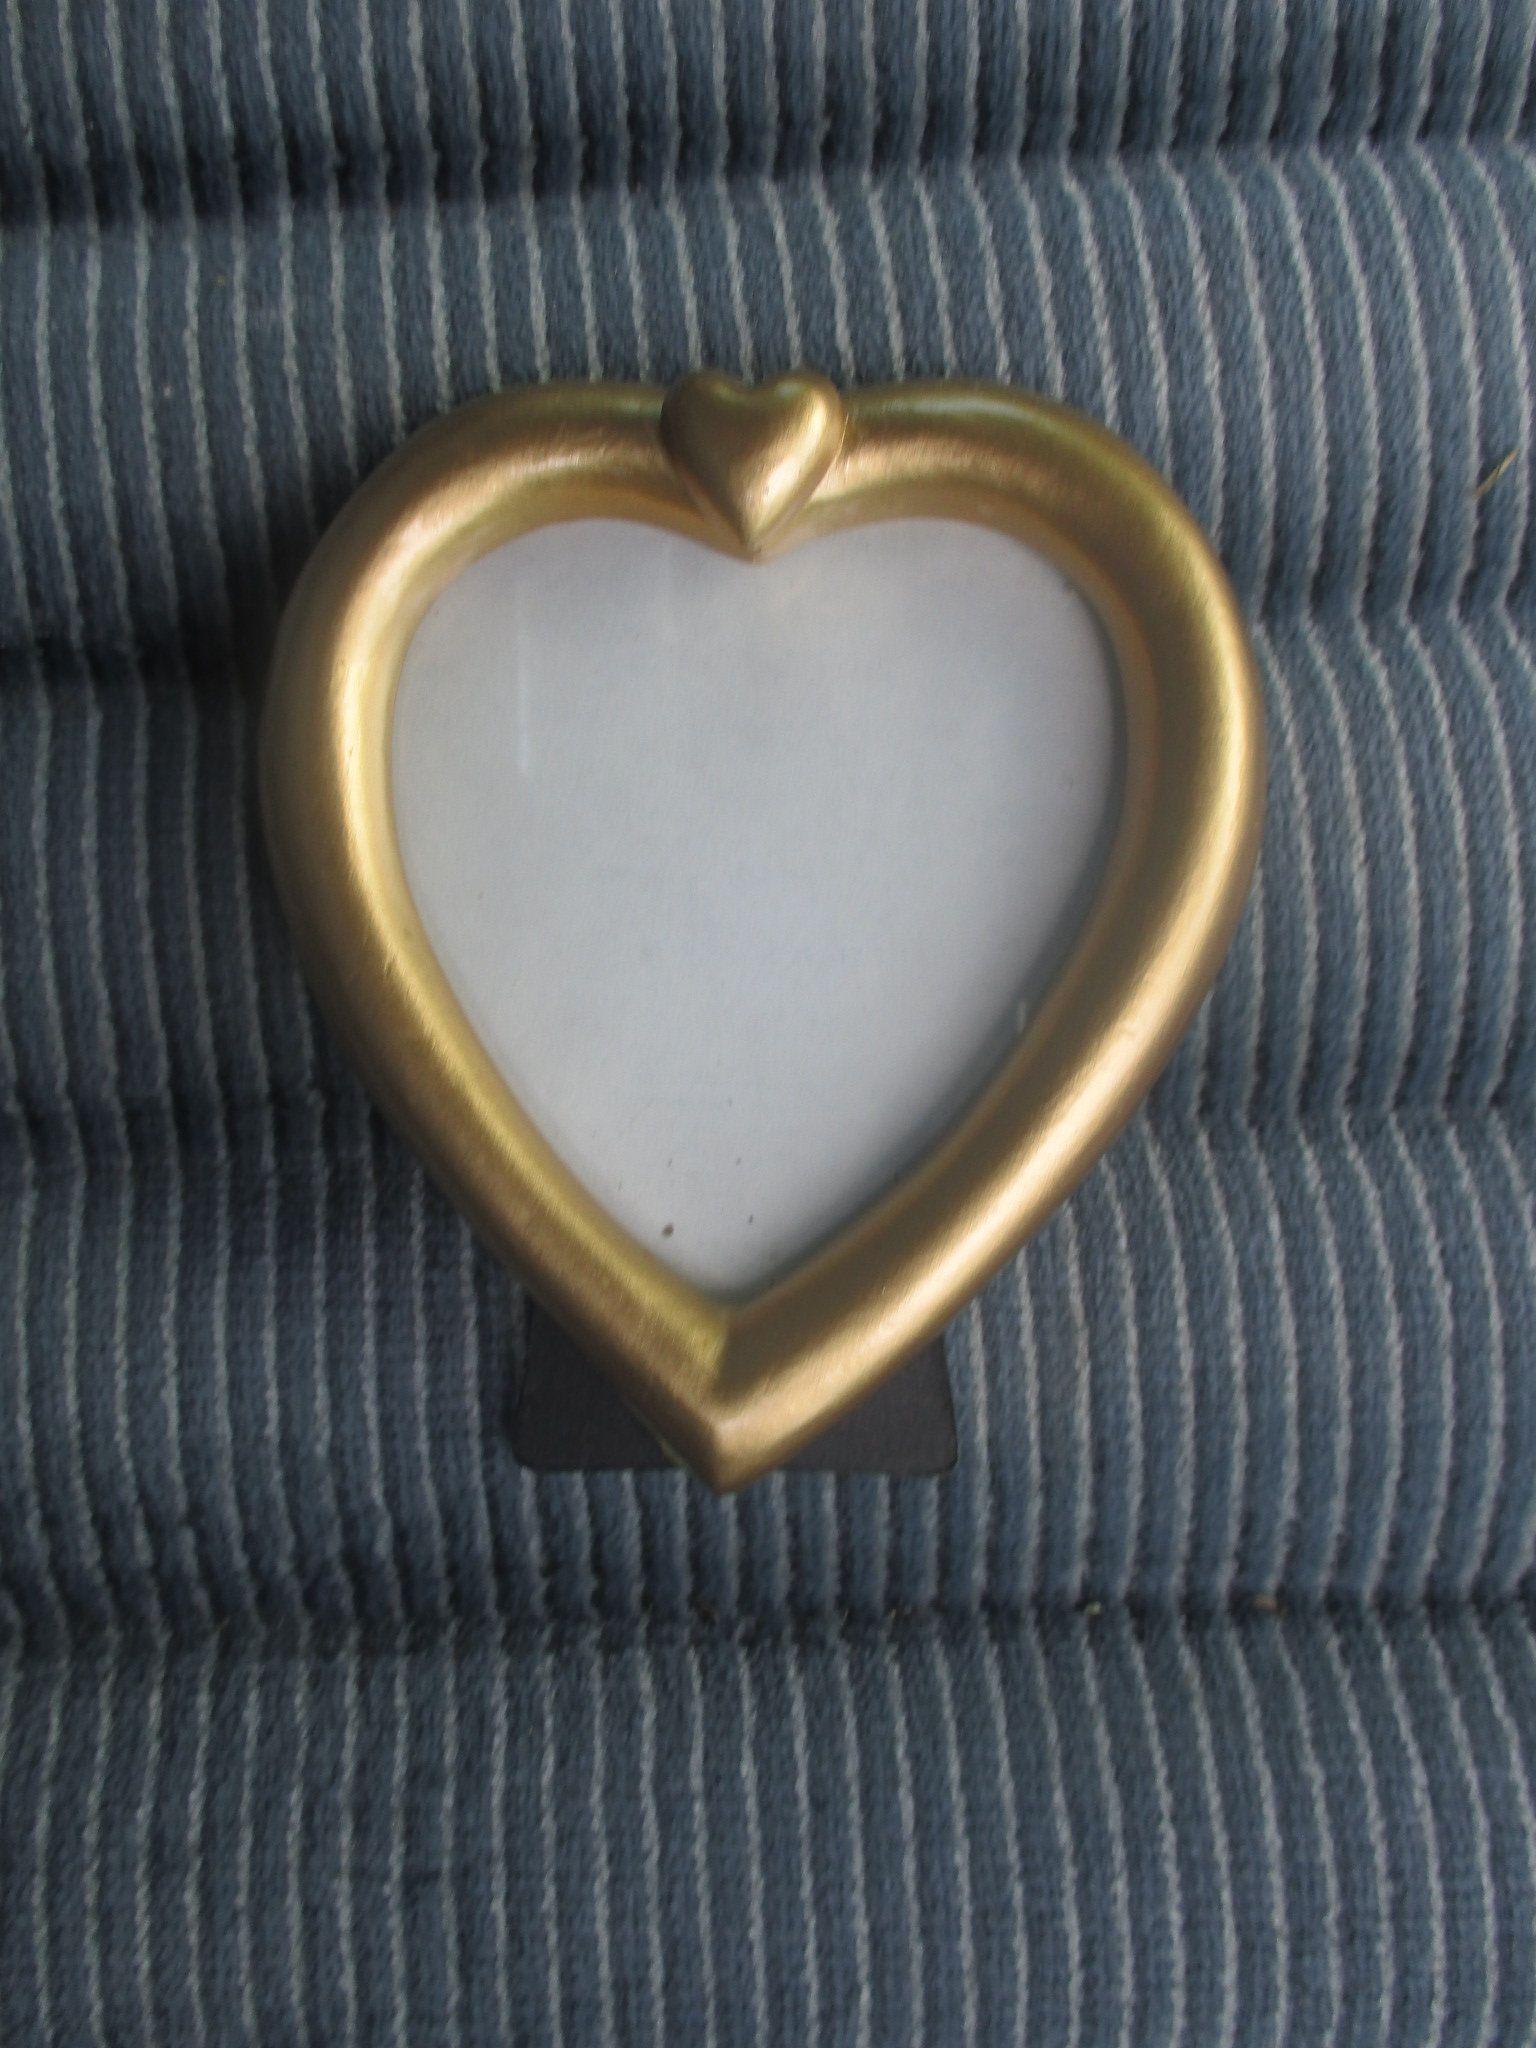 Reduced Vtg Gold Tone Romantic Heart Shape Design Small Easel Back